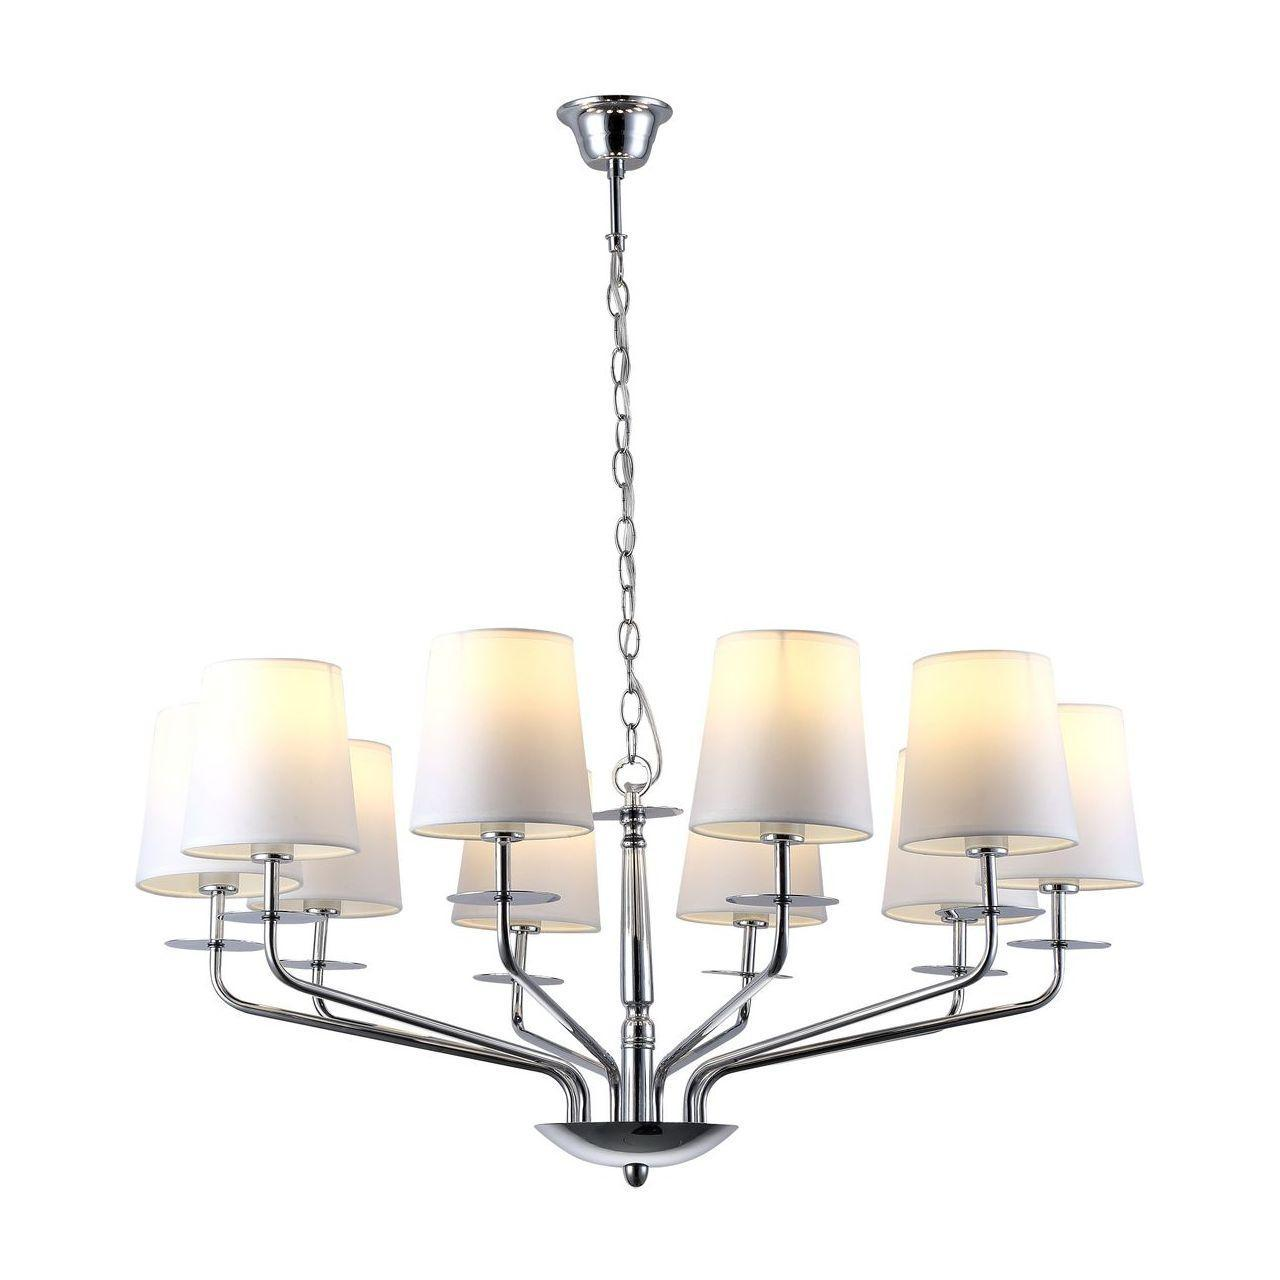 Люстра Arte Lamp A1048LM-10CC подвесная arte lamp люстра на штанге arte lamp palla a9162lm 10cc